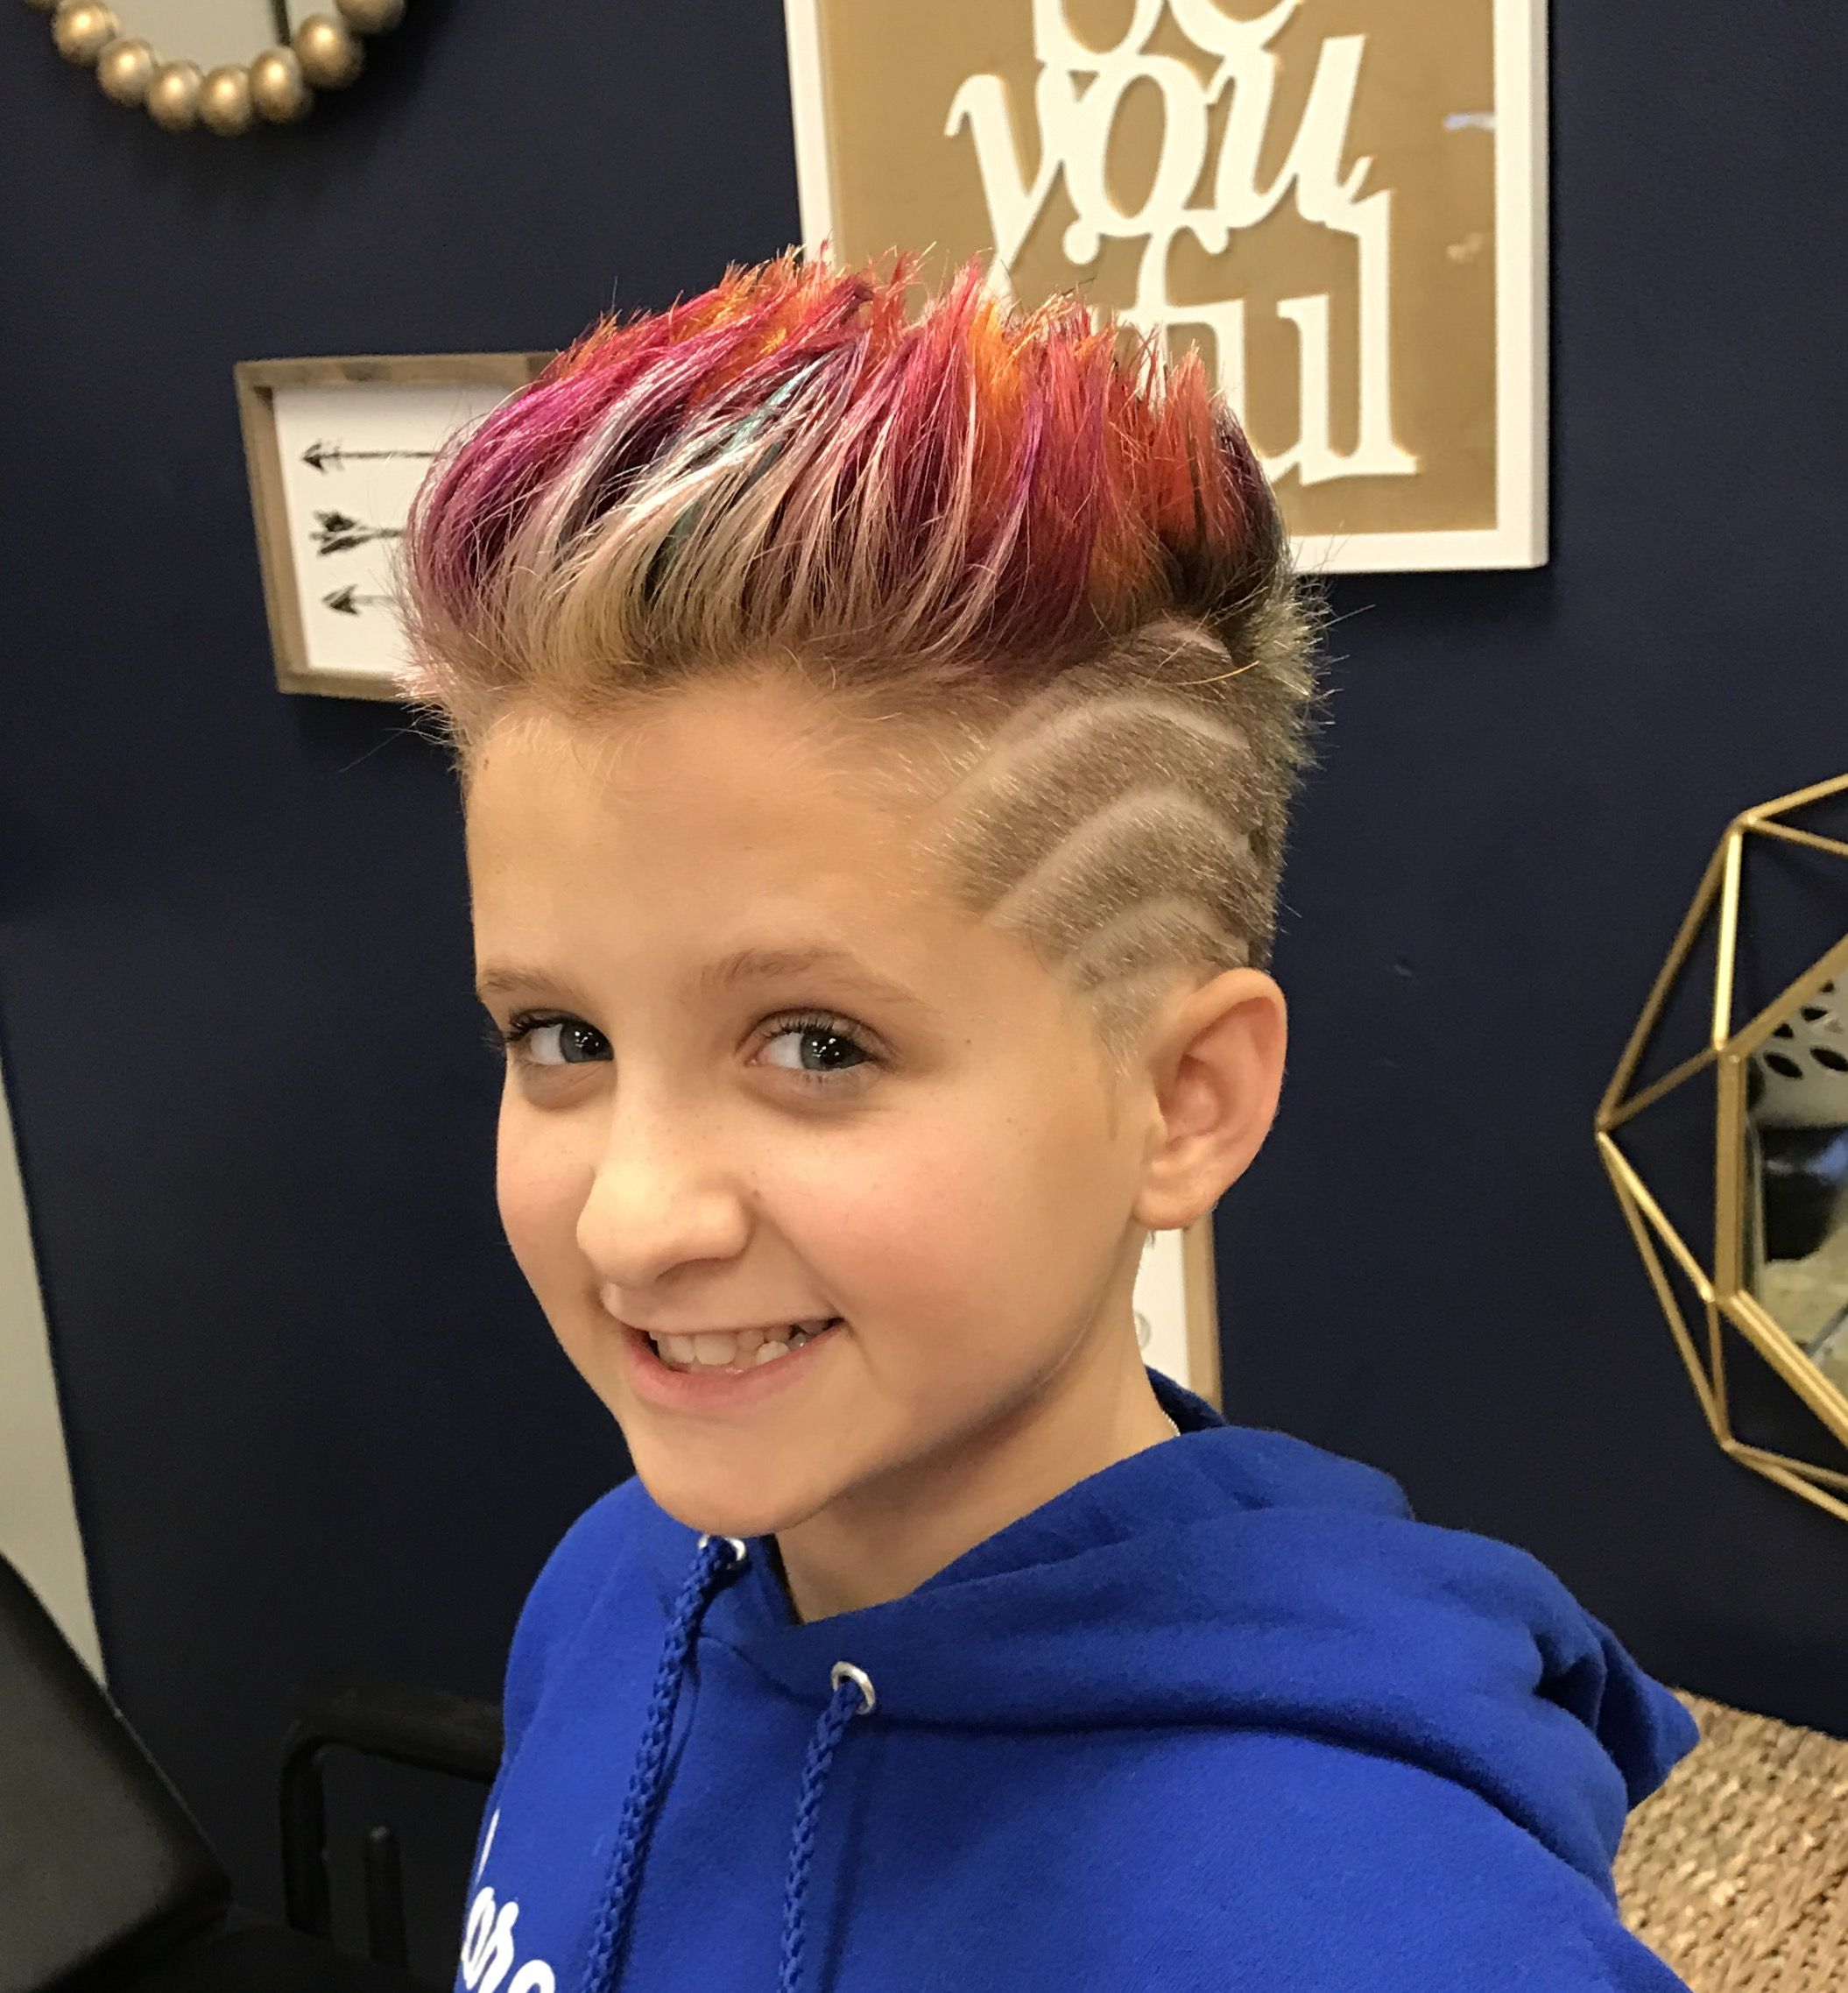 best pre-chemo haircut ever! | kids in 2019 | hair cuts, summer